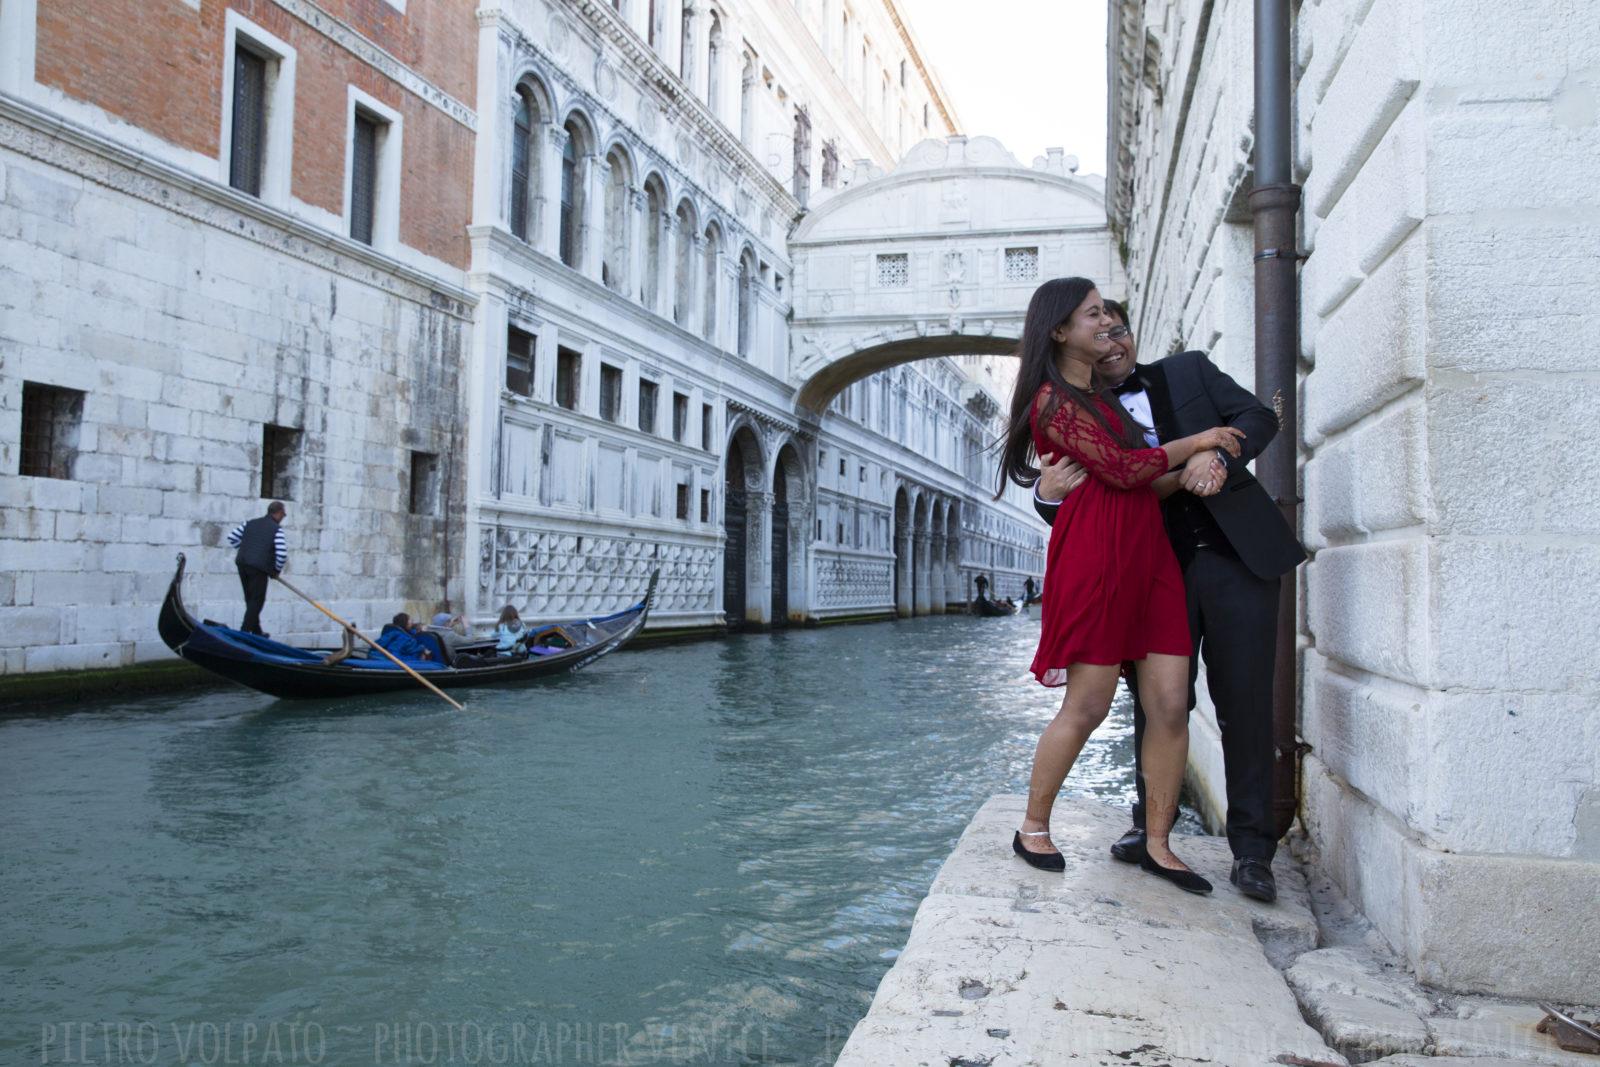 photographer-venice-italy-honeymoon-photo-shoot-romantic-fun-walking-tour-20160429_01